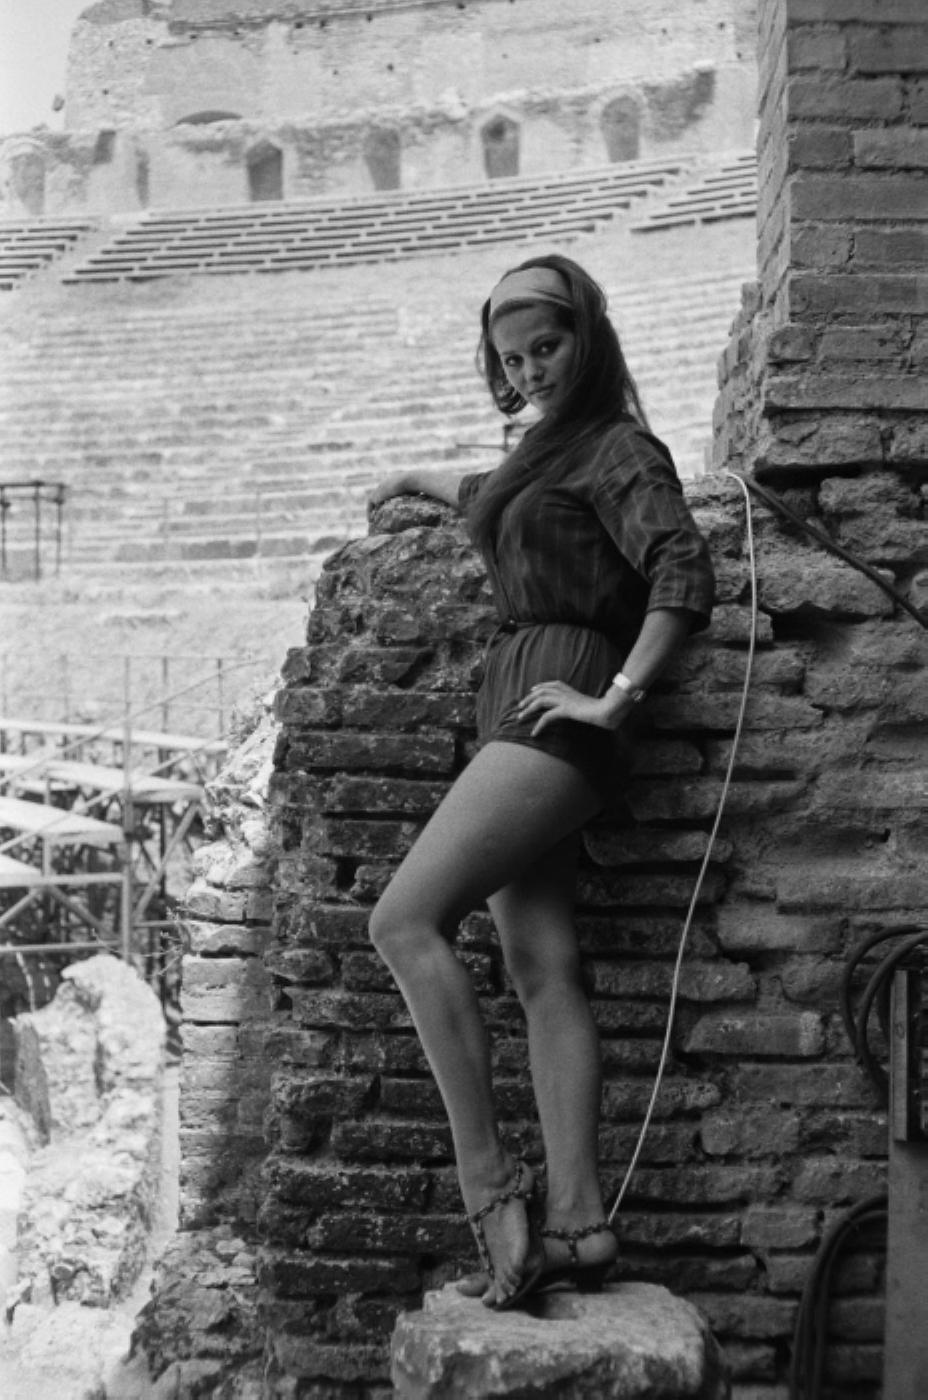 claudia cardinale feet - photo #39